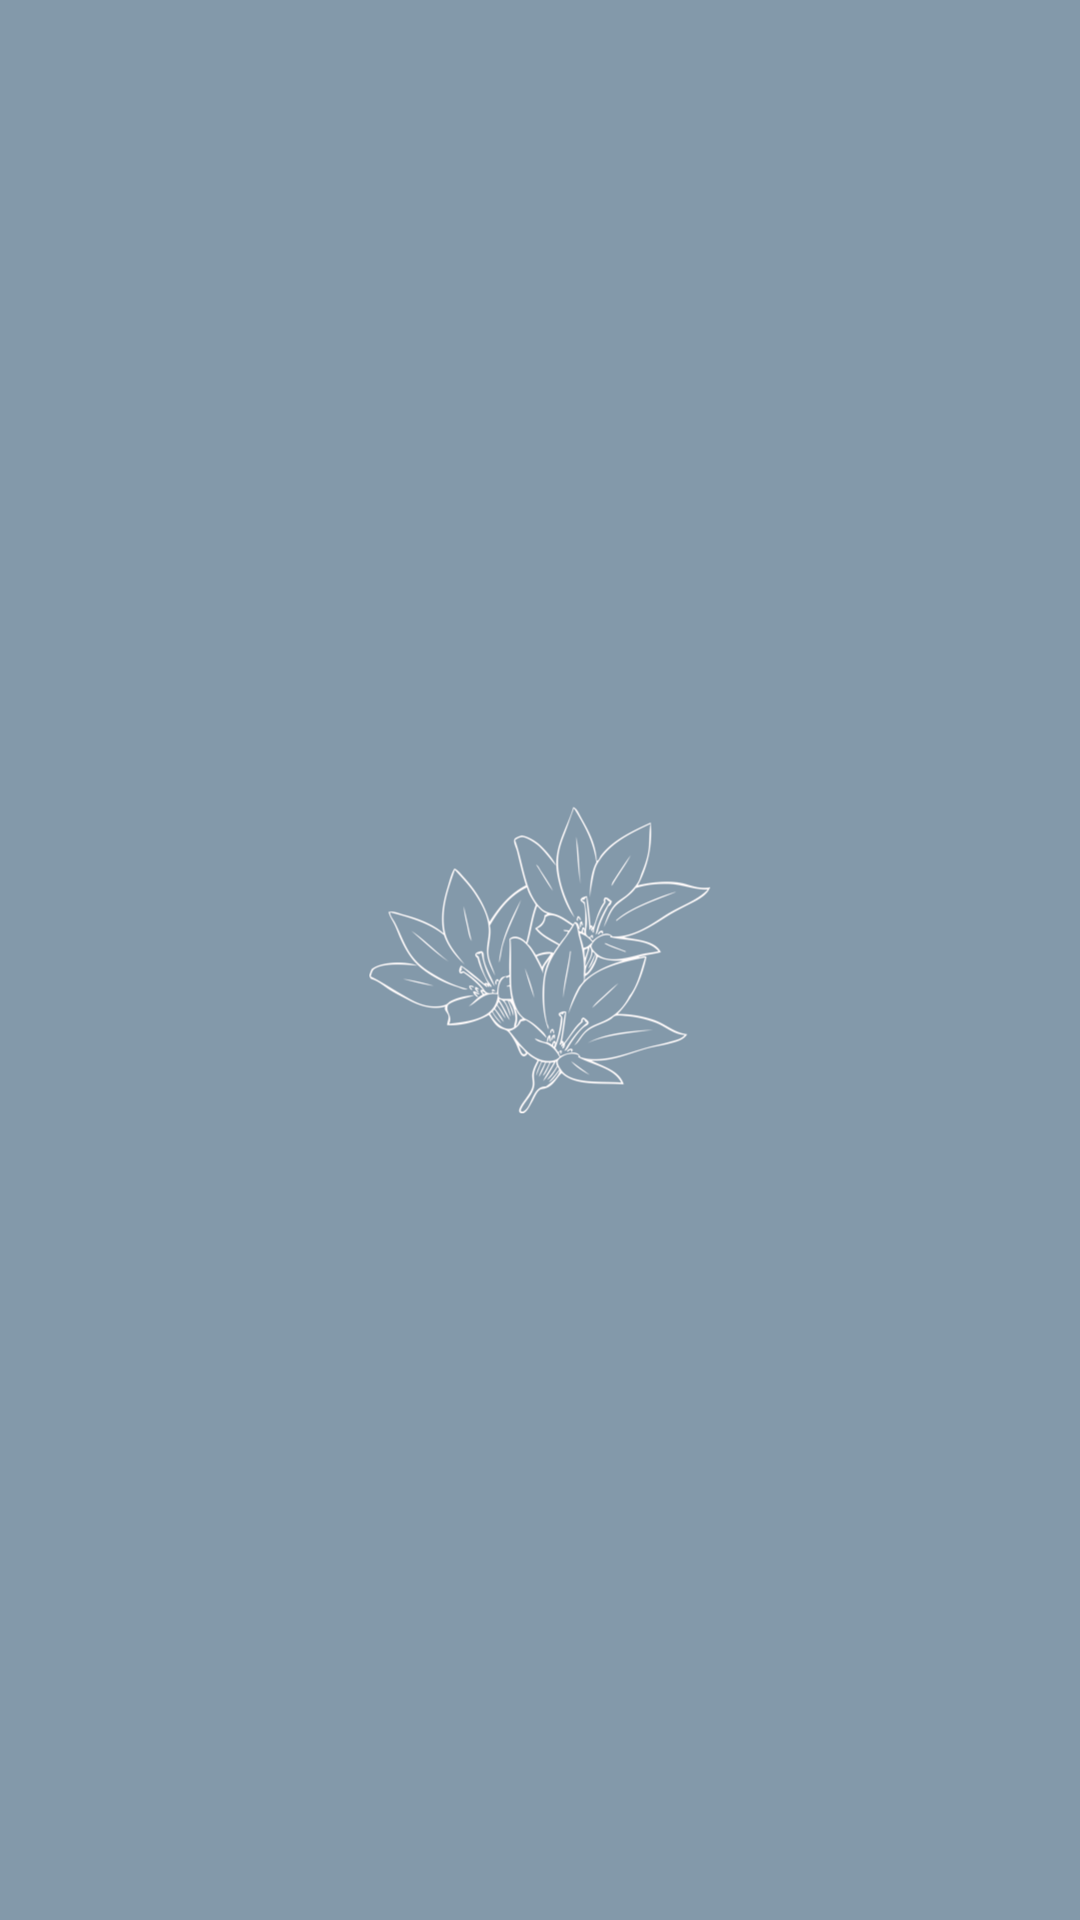 Pin On Spongebob Wallpaper In 2020 Cute Simple Wallpapers Minimal Wallpaper Blue Wallpaper Iphone